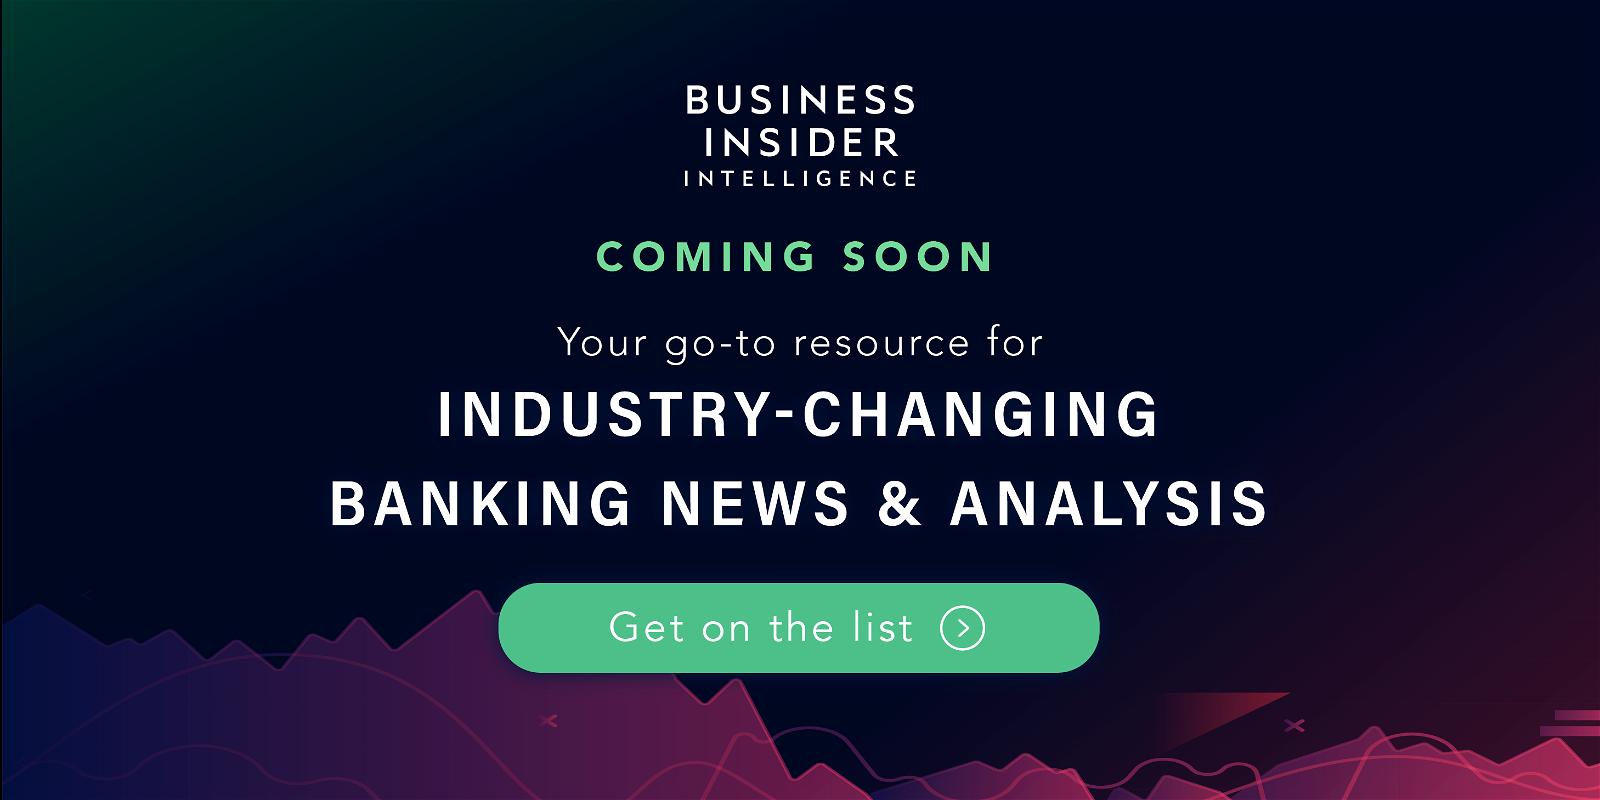 Business Insider Intelligence is launching Banking Pro